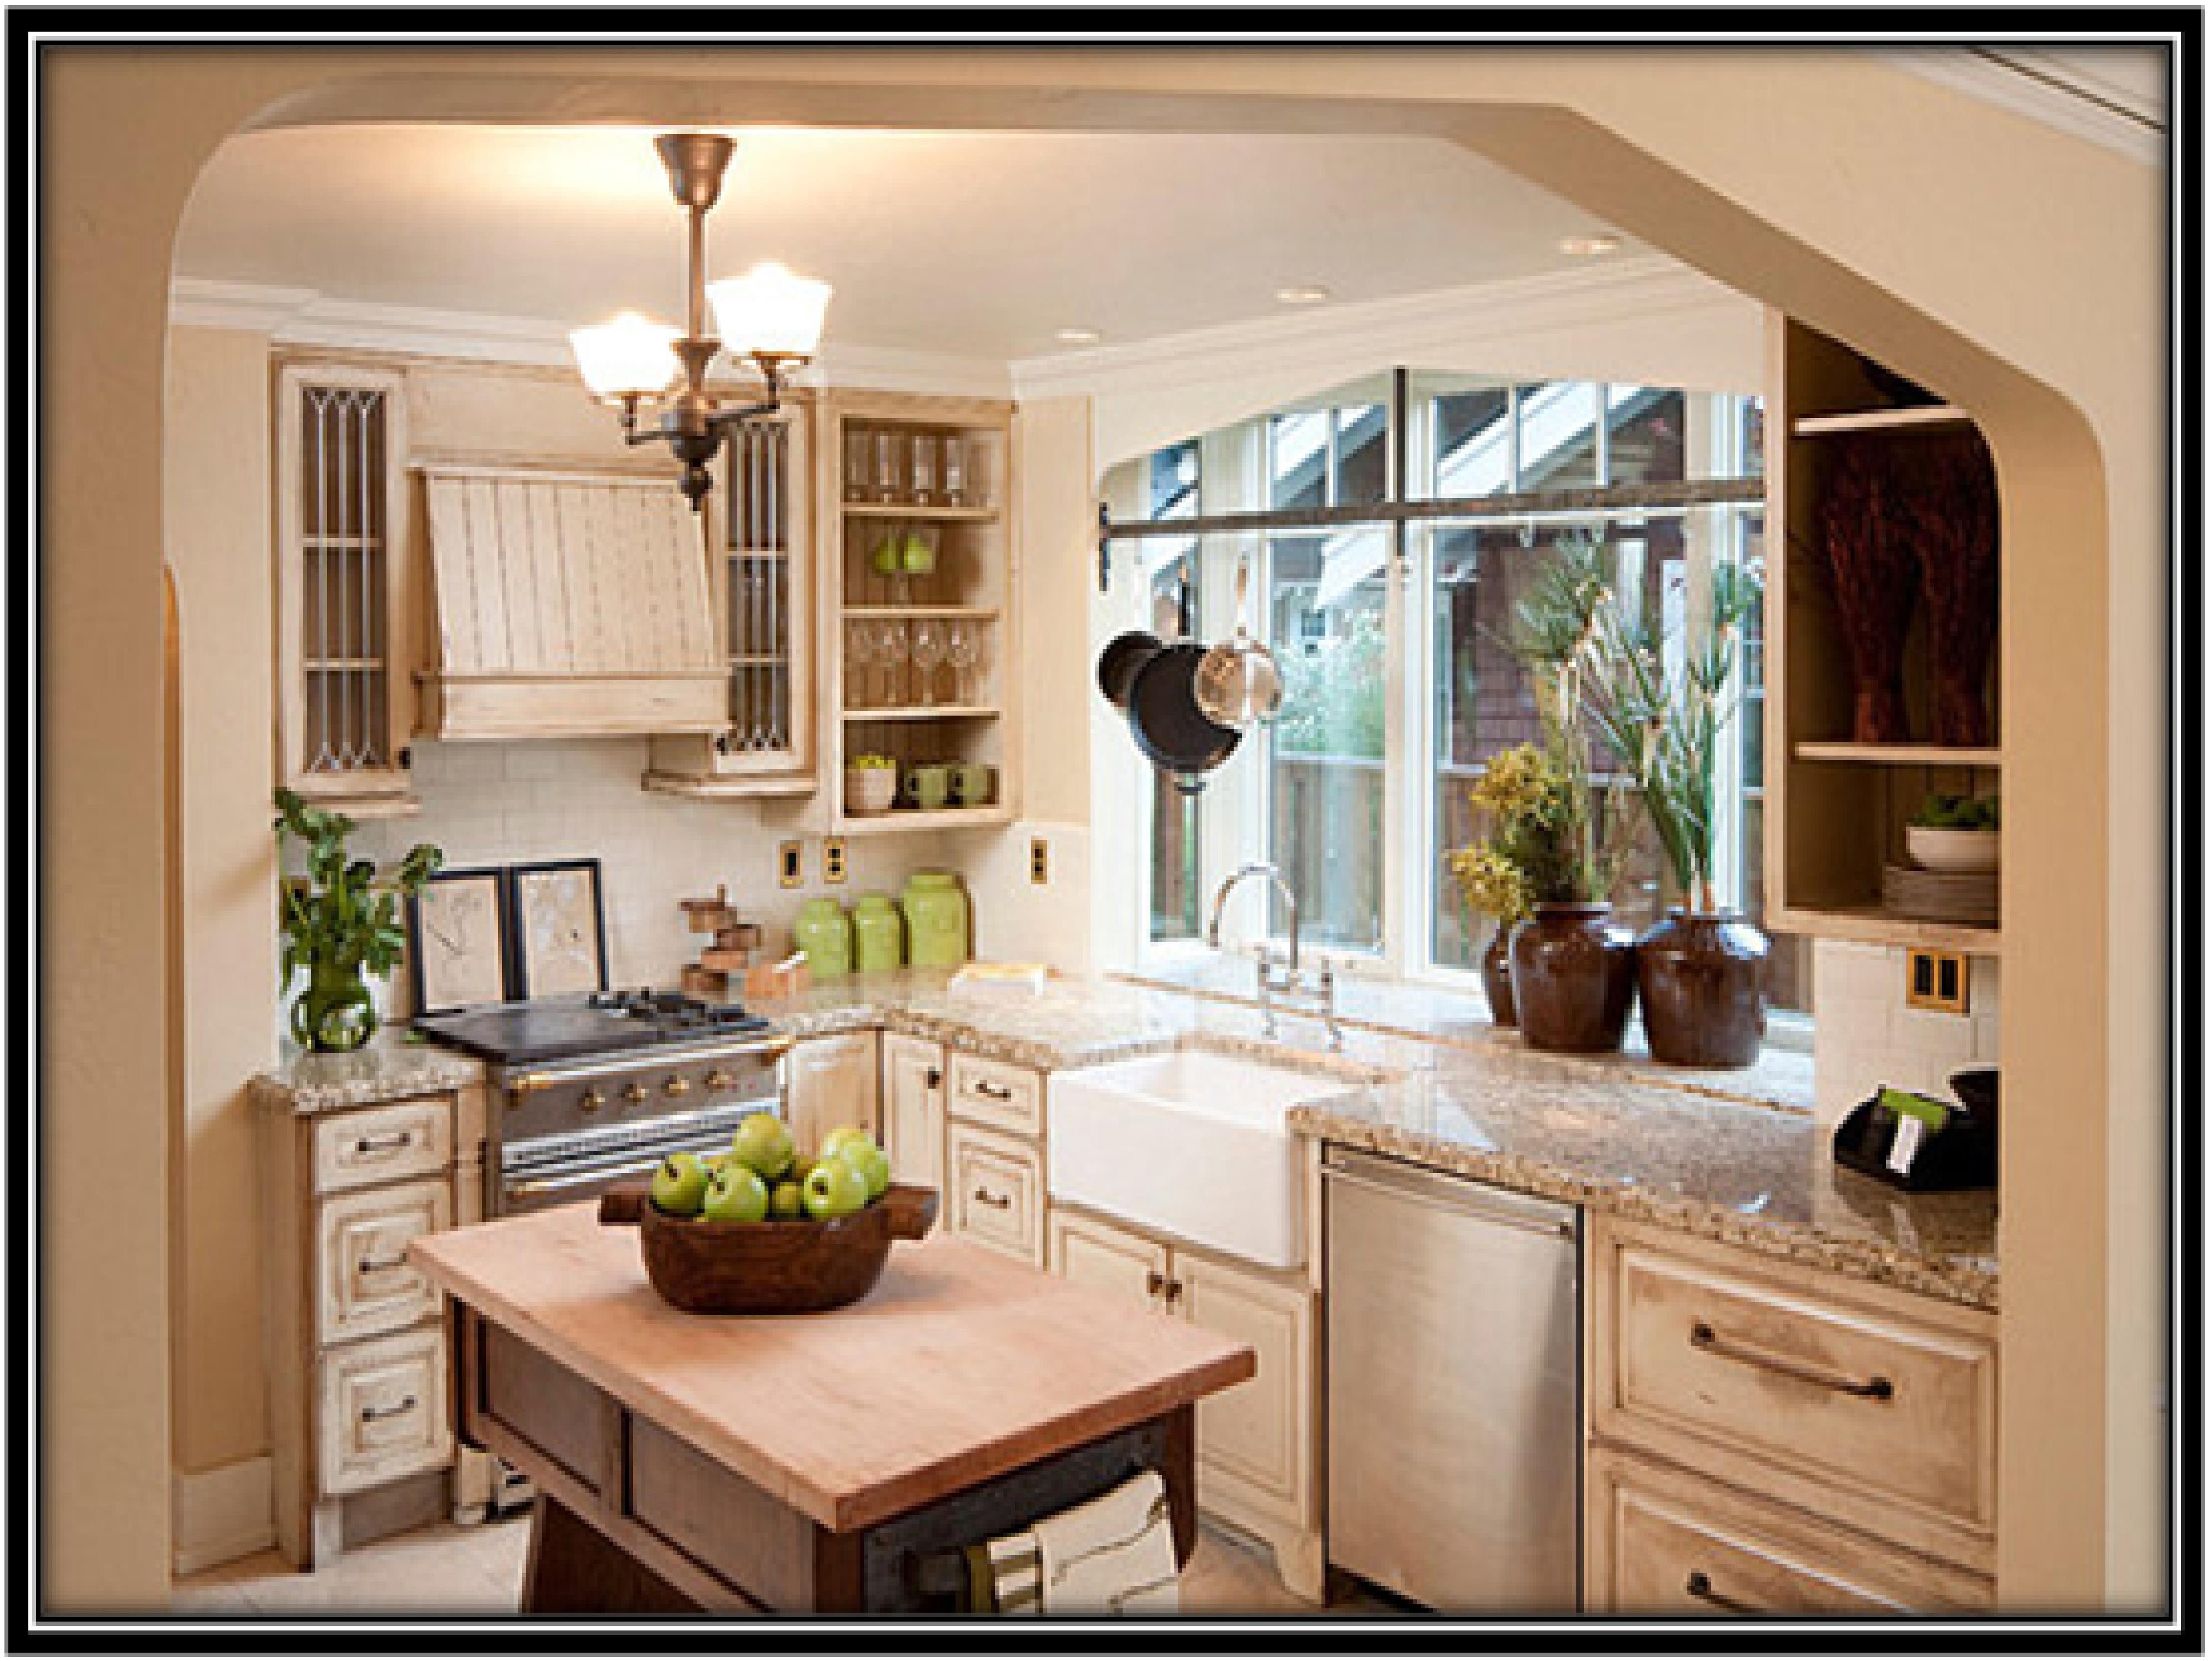 kitchen decor ideas - home decor ideas